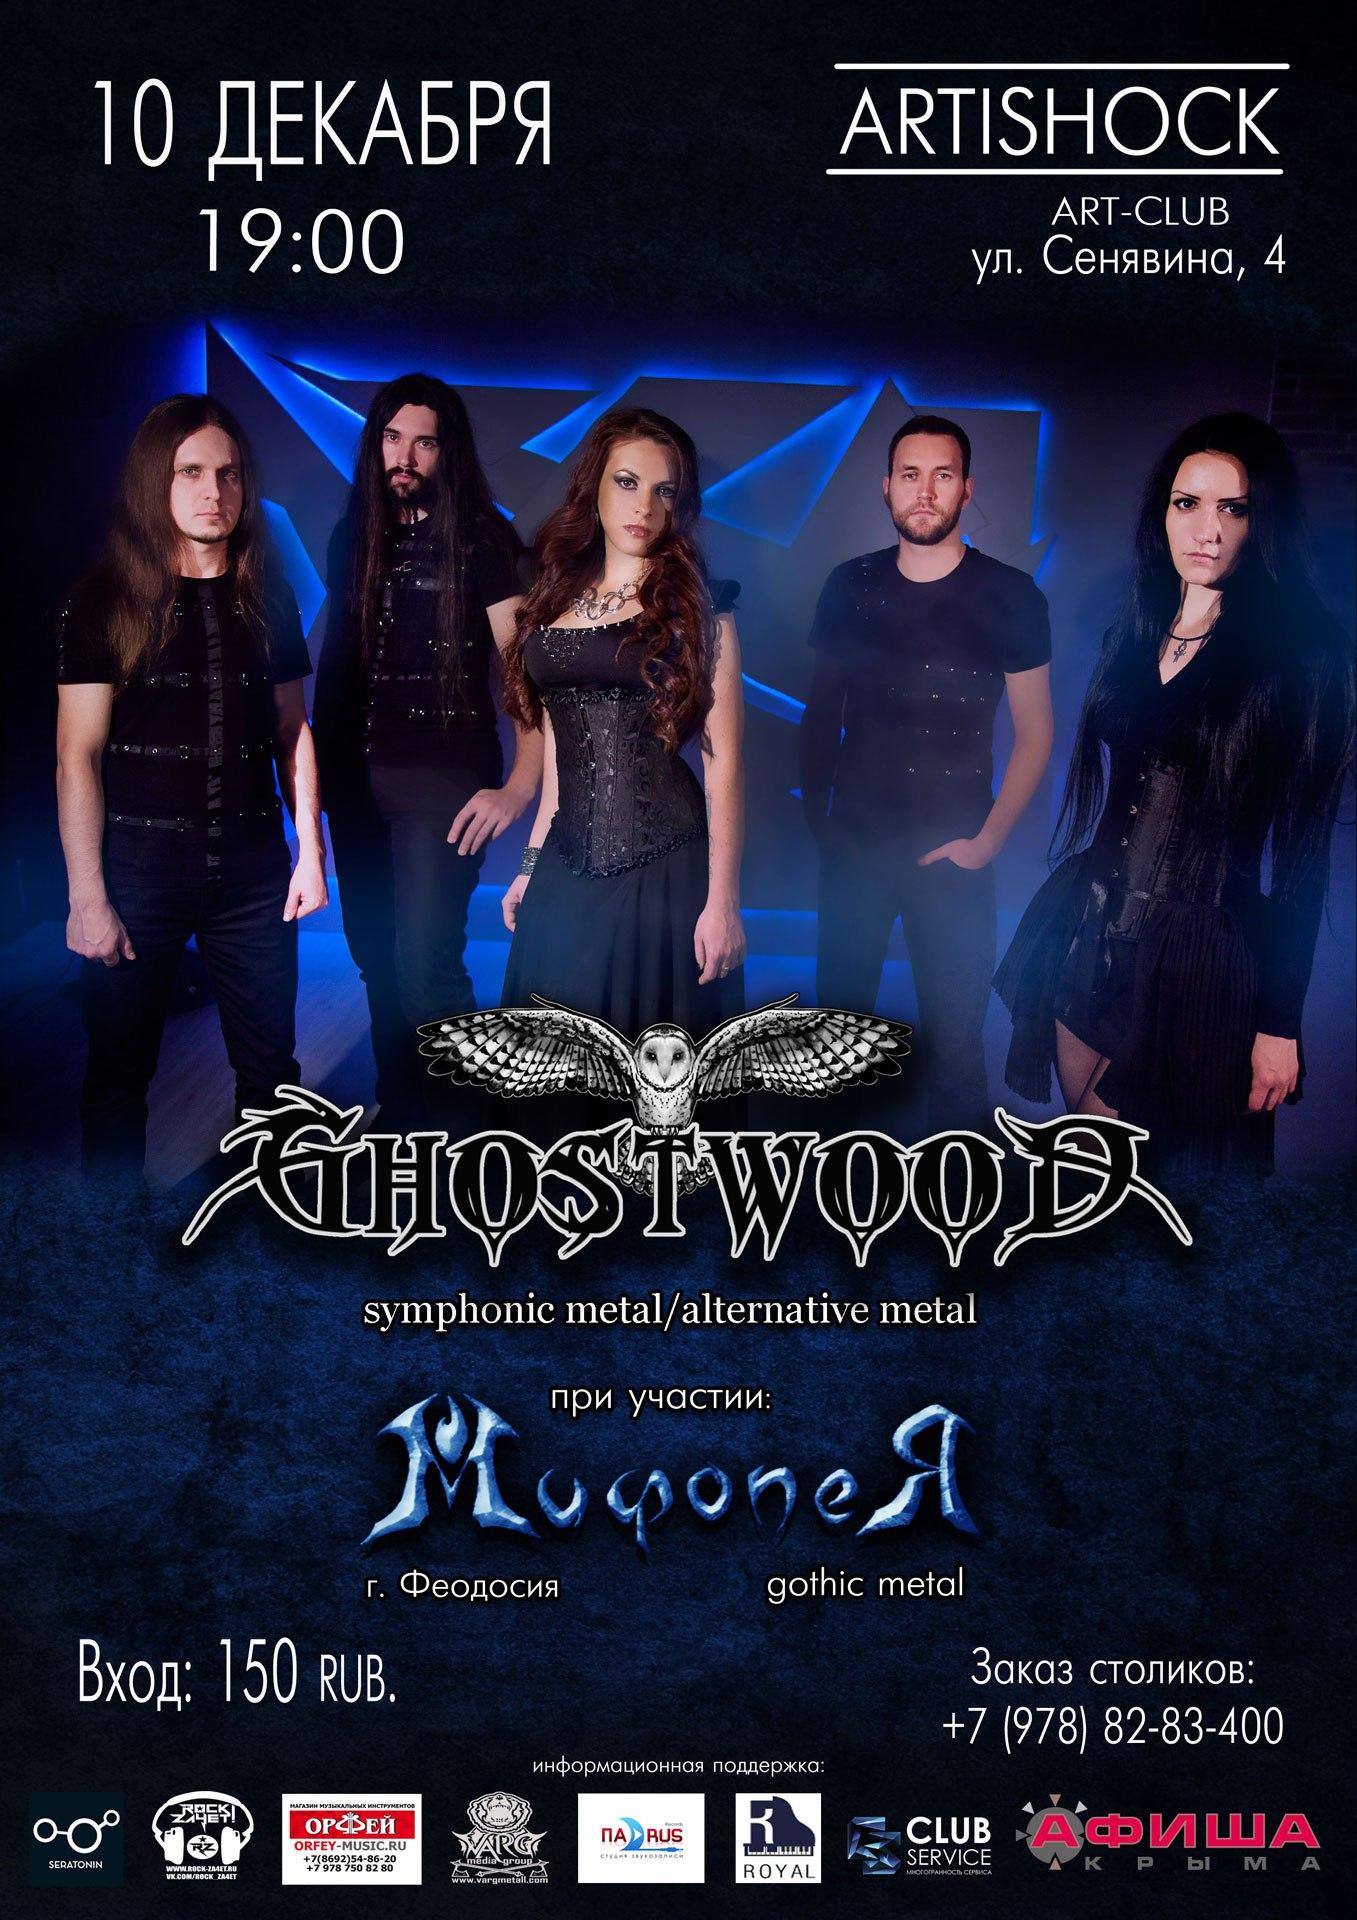 ghostwood artishock